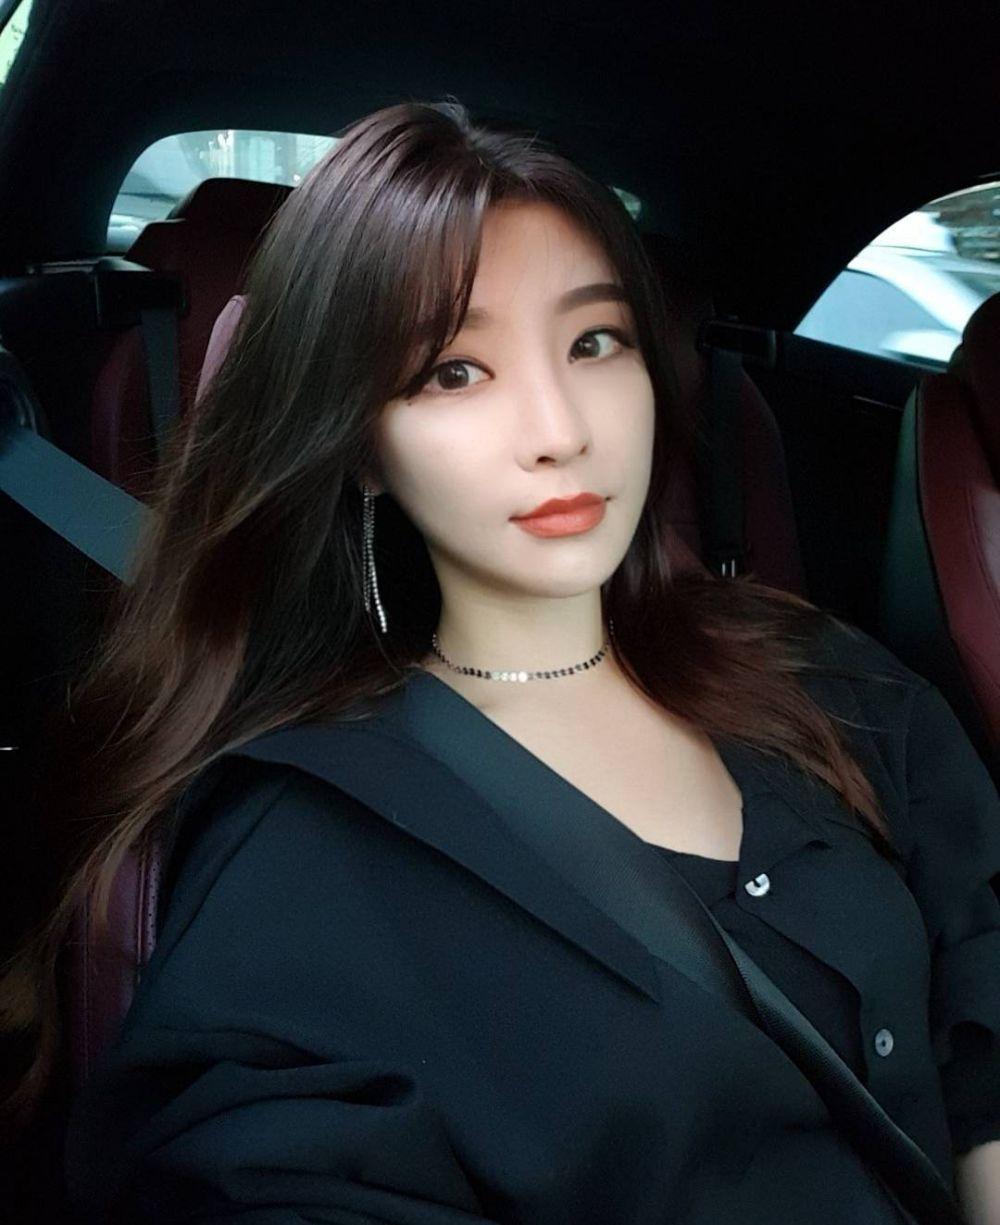 Park Hyun Seo © 2017 instagram.com/hyunseo_hi